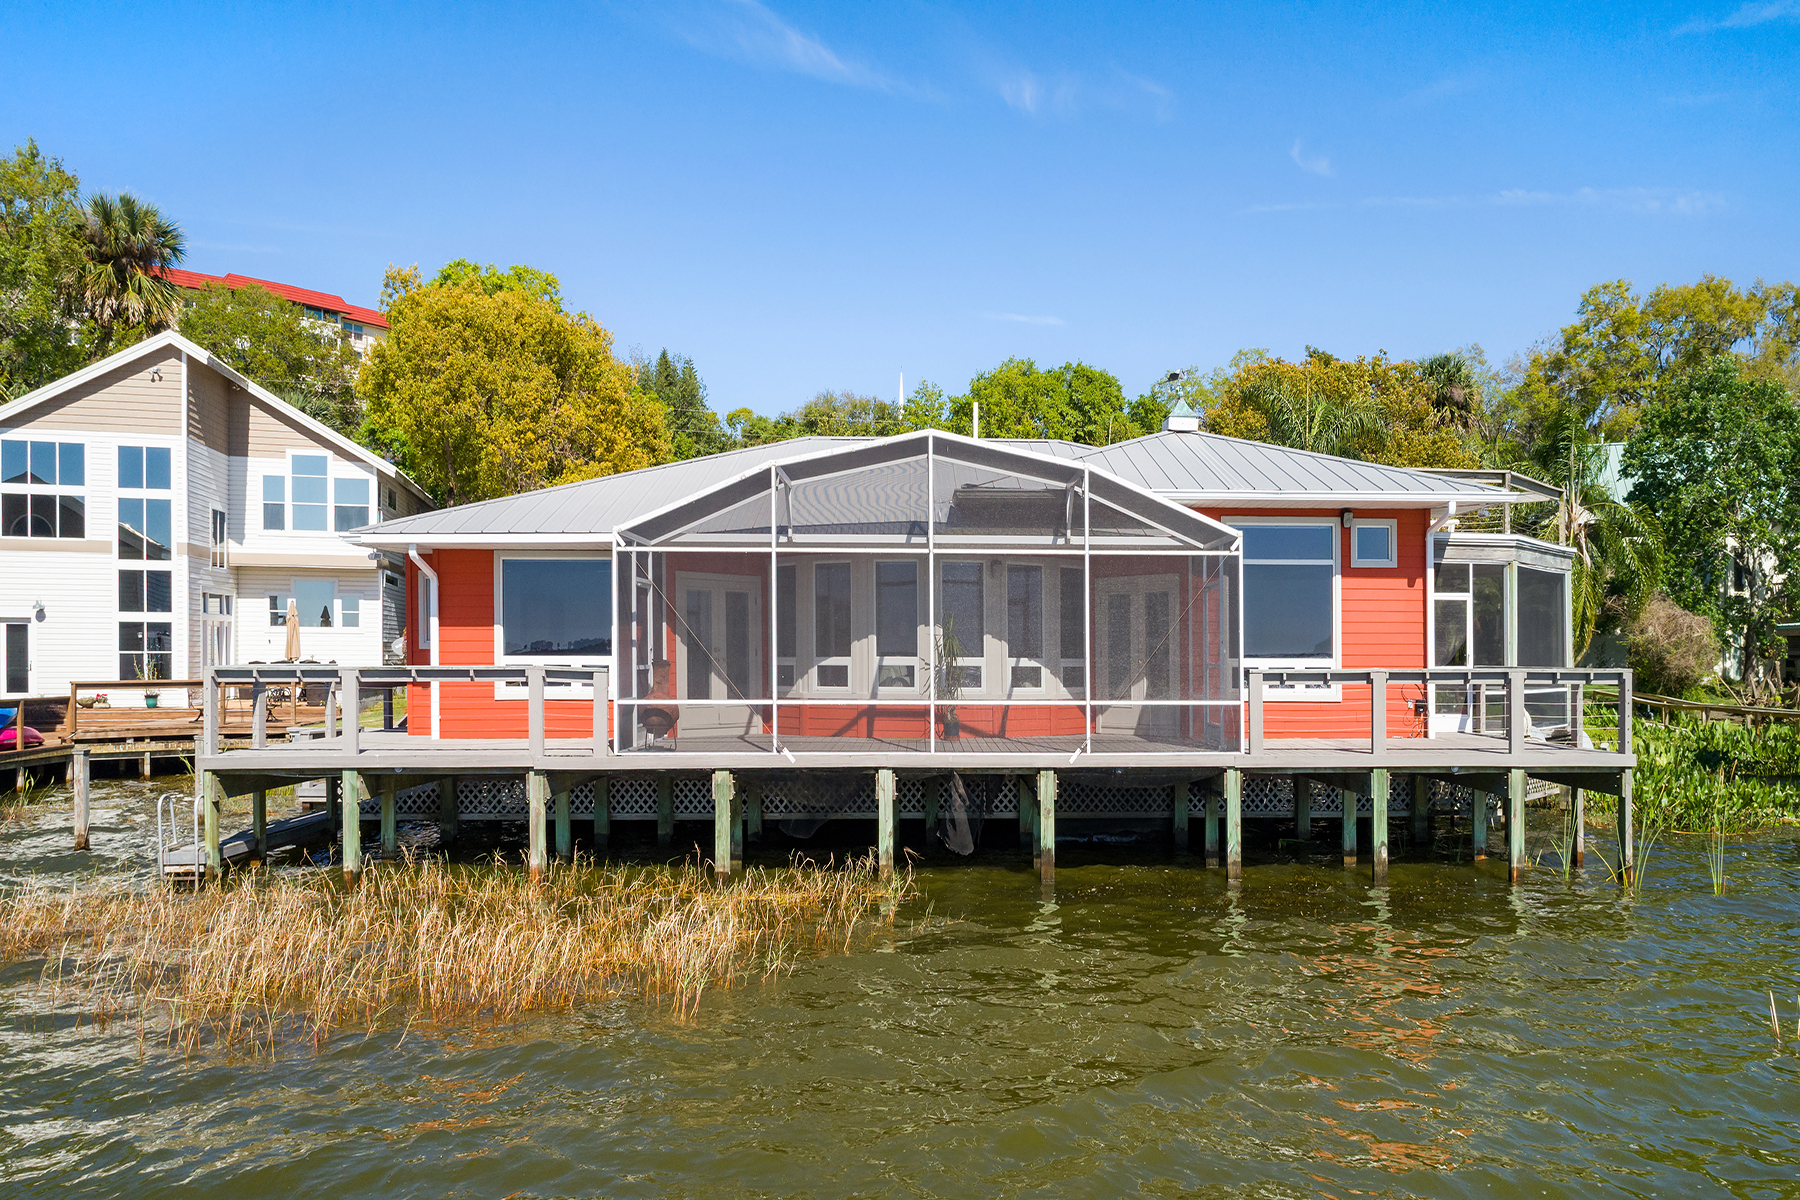 Single Family Home for Sale at ORLANDO - MOUNT DORA 401 & 401 Lake Dora Rd, Mount Dora, Florida, 32757 United States